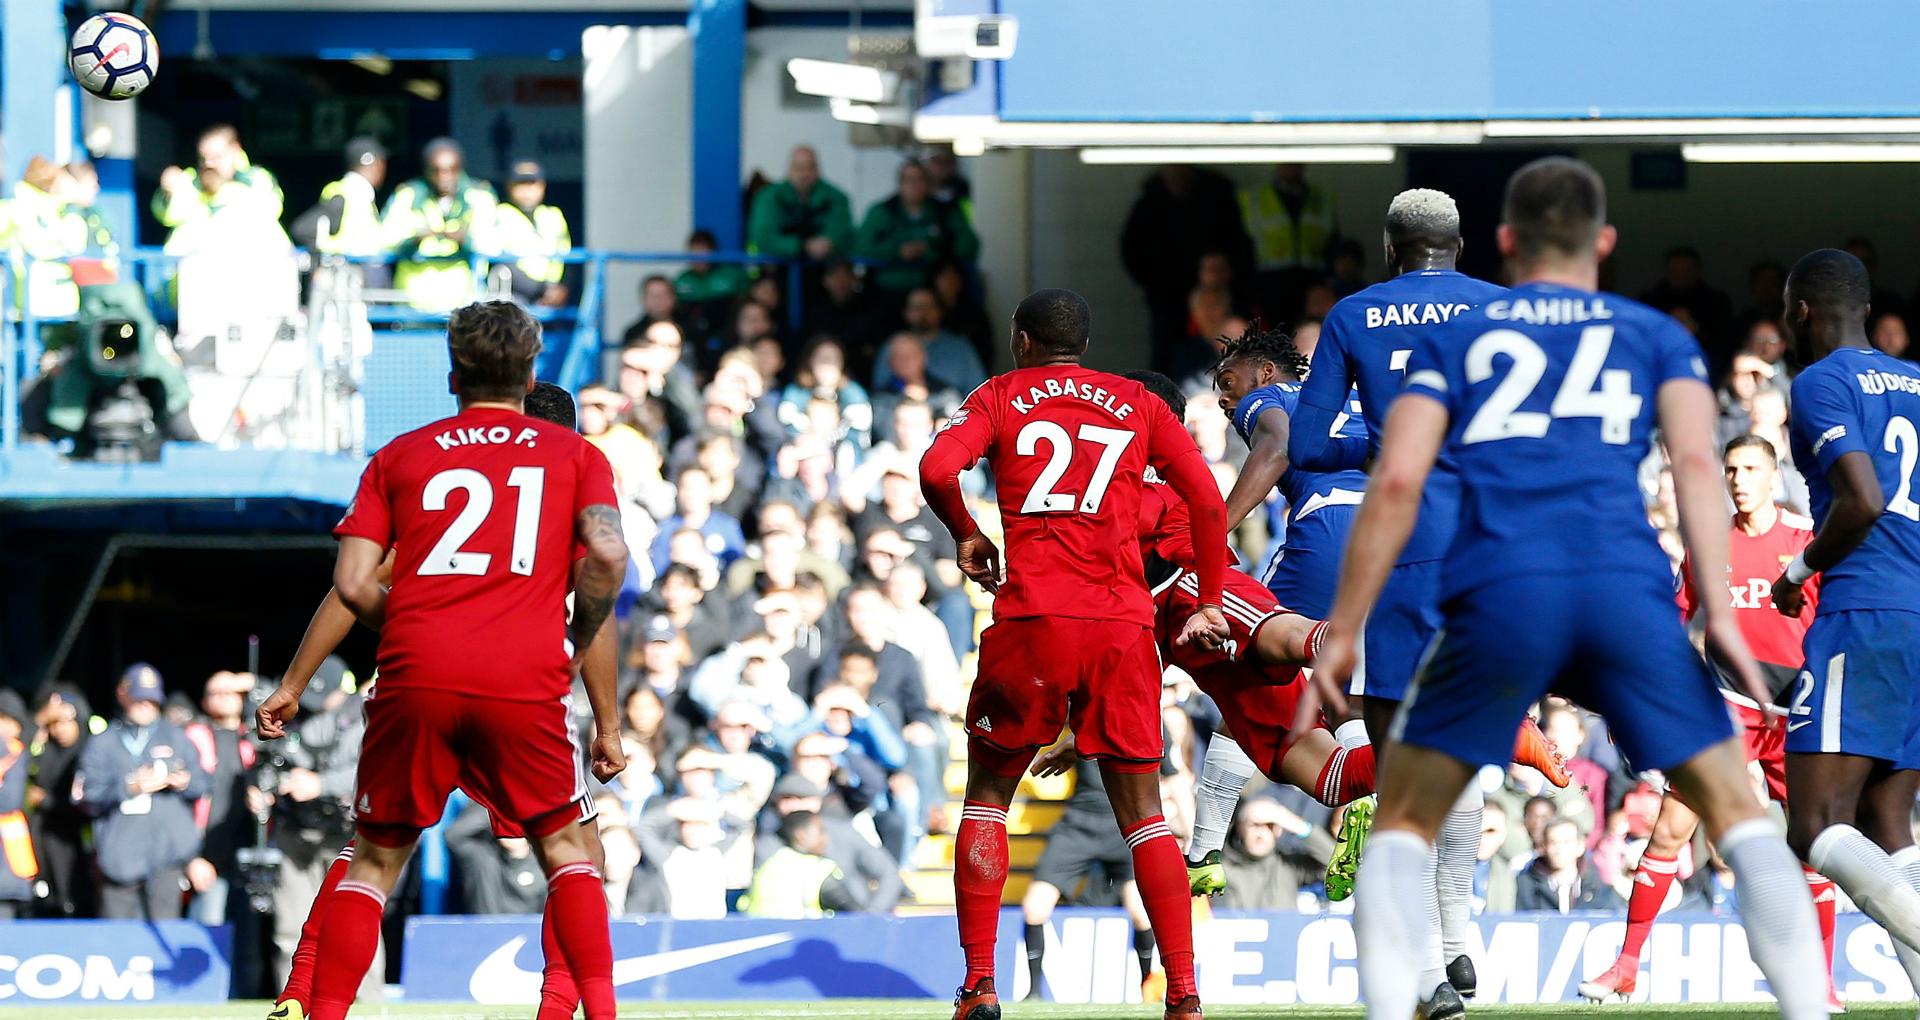 Batshuayi Chelsea Watford 2112017